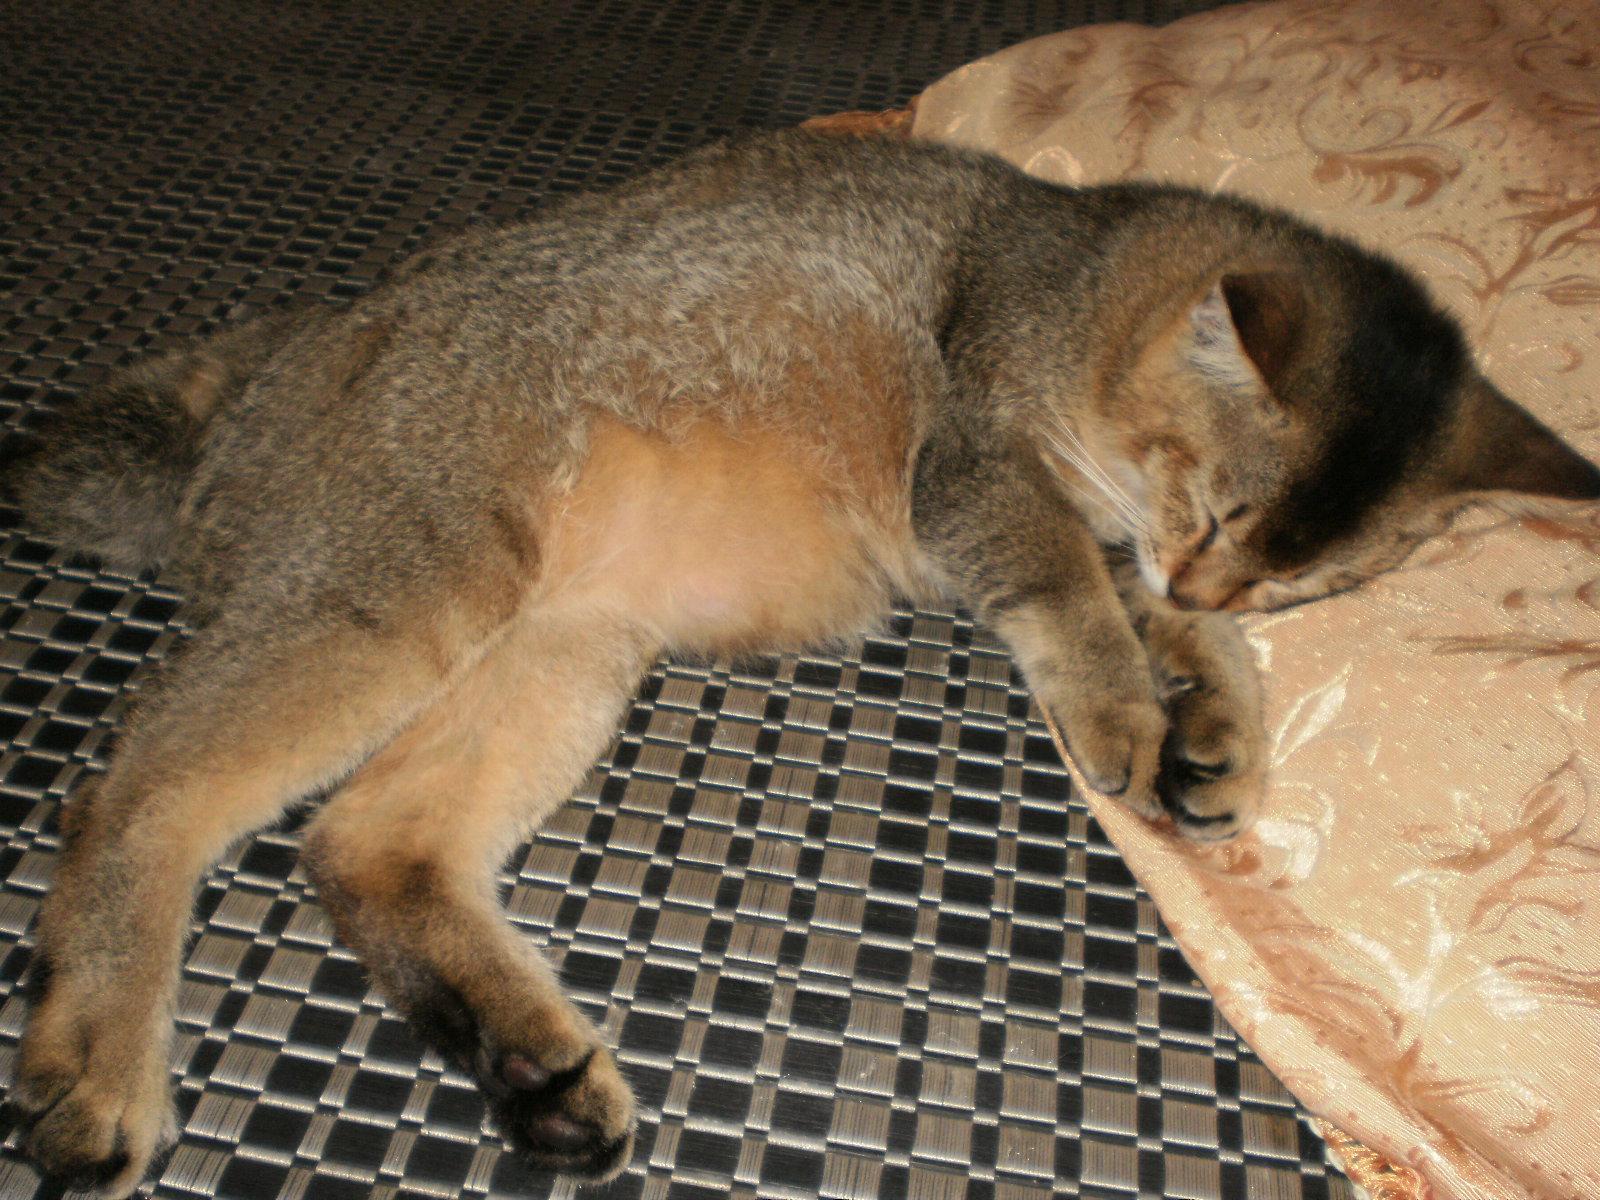 Mimpi Kucing Dan Anak Kecil Arti Mimpi Dikejar Hantu Setan